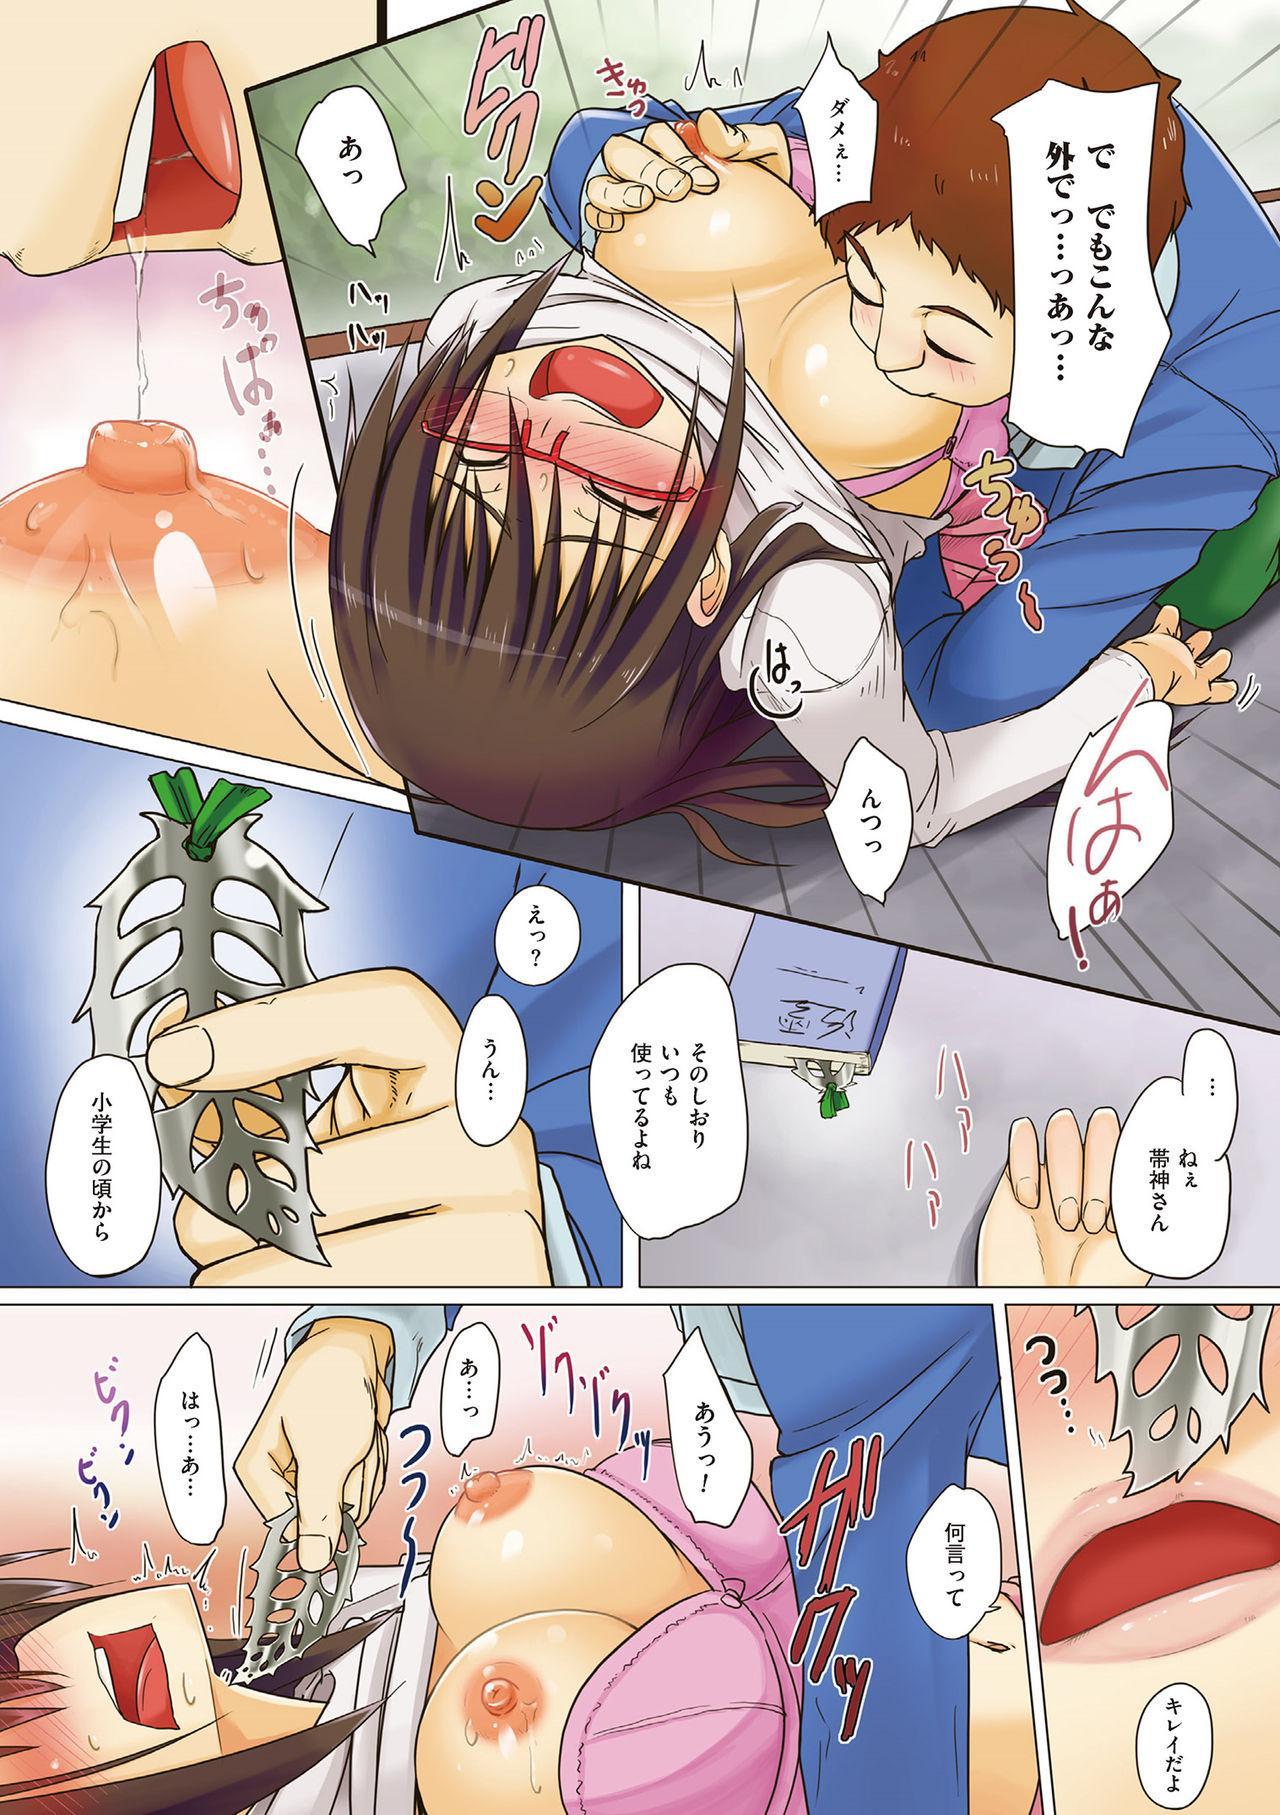 [Kosuke Haruhito] Are-zuki Kanojo - happy sexperience [Digital] 171